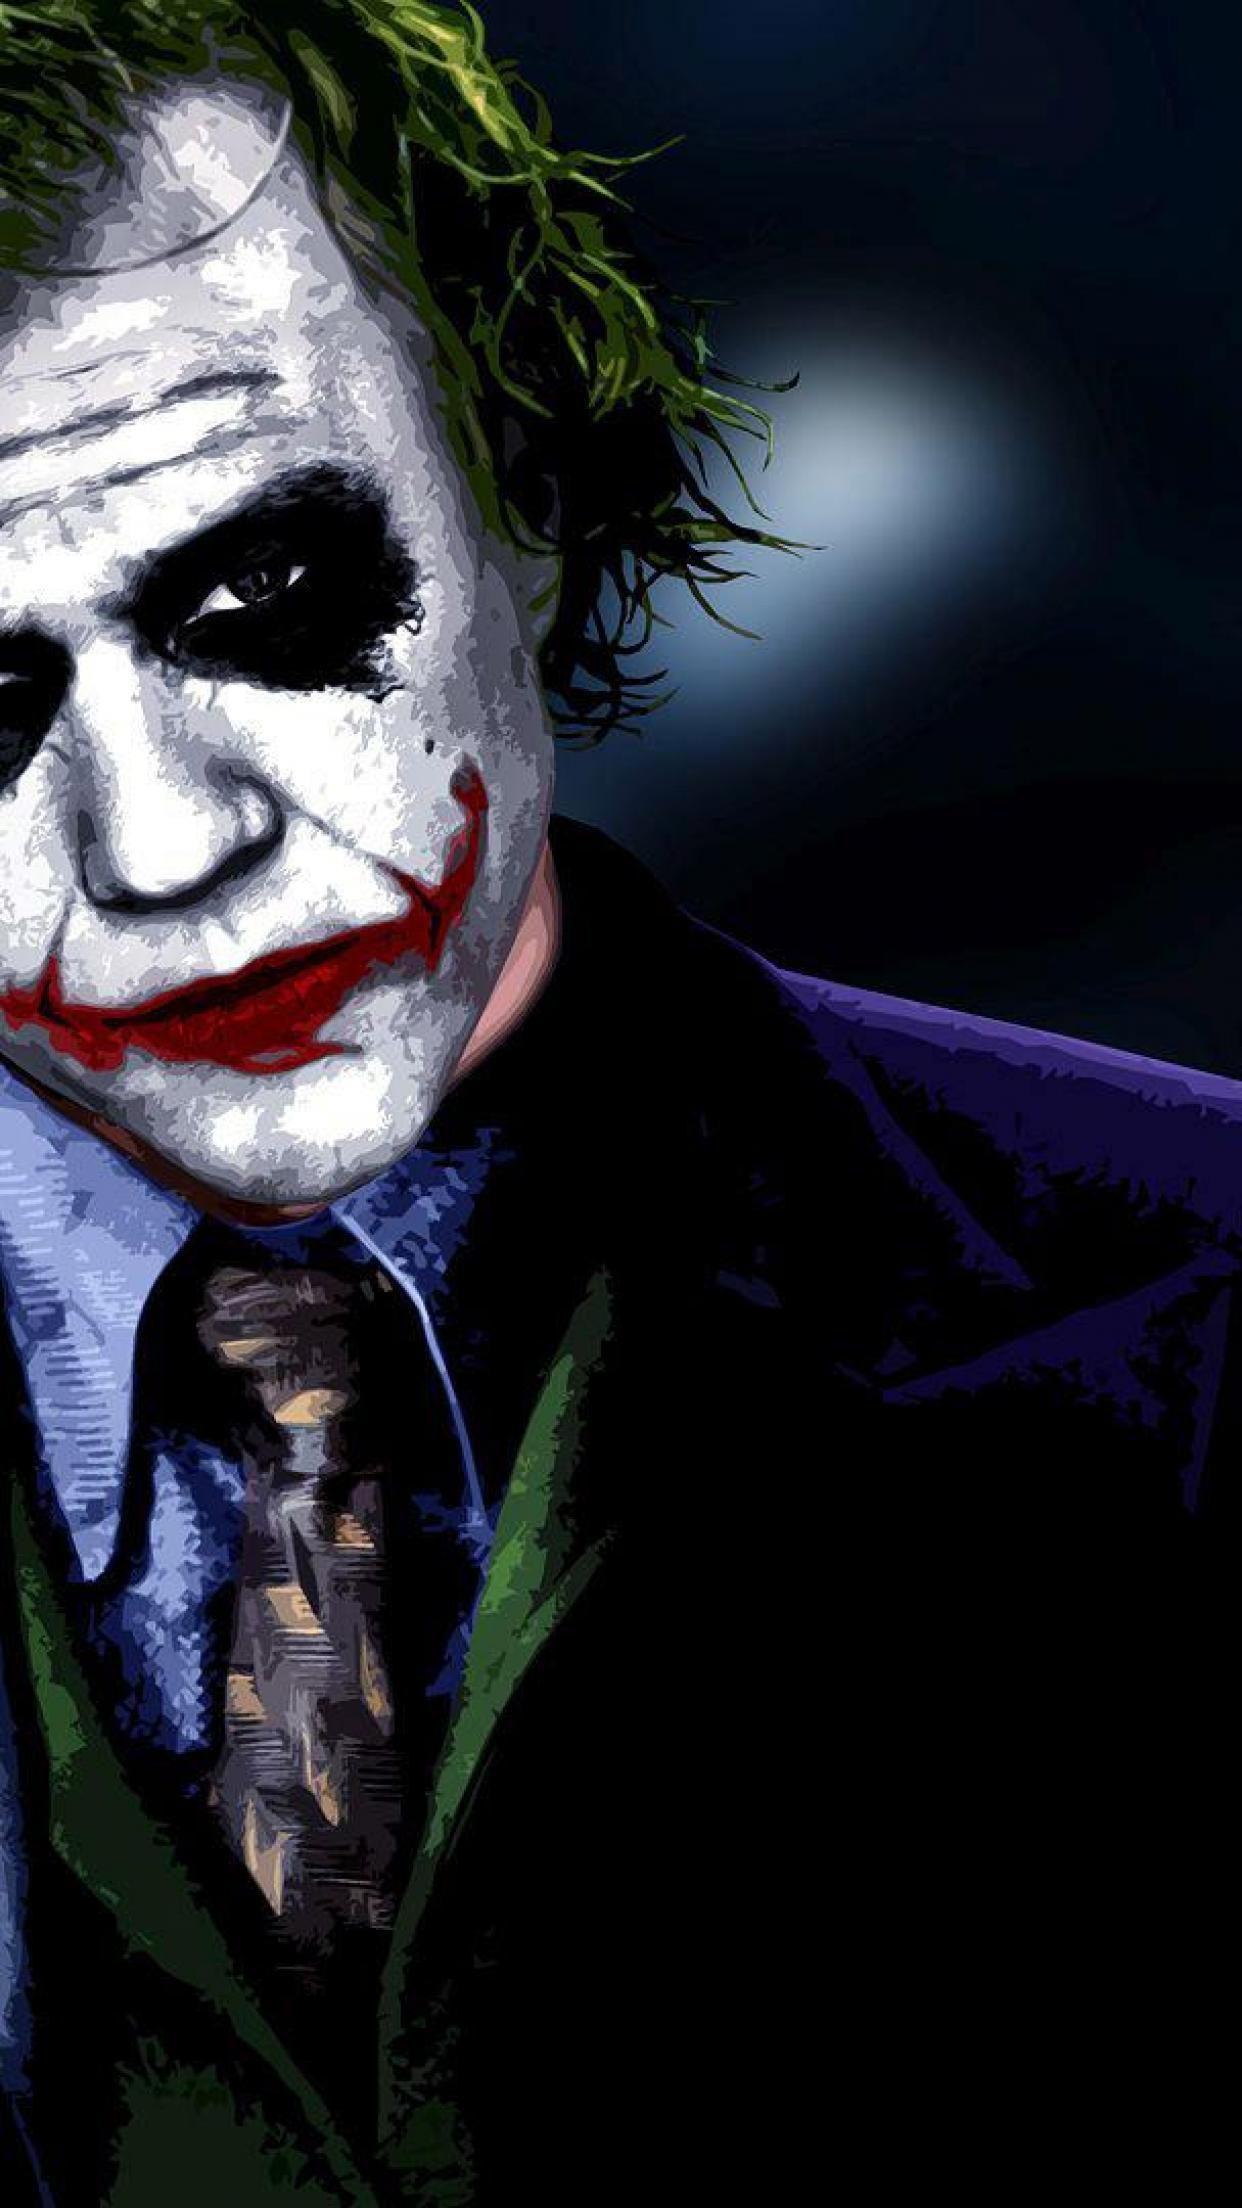 Heath Ledger Joker Wallpapers Top Free Heath Ledger Joker